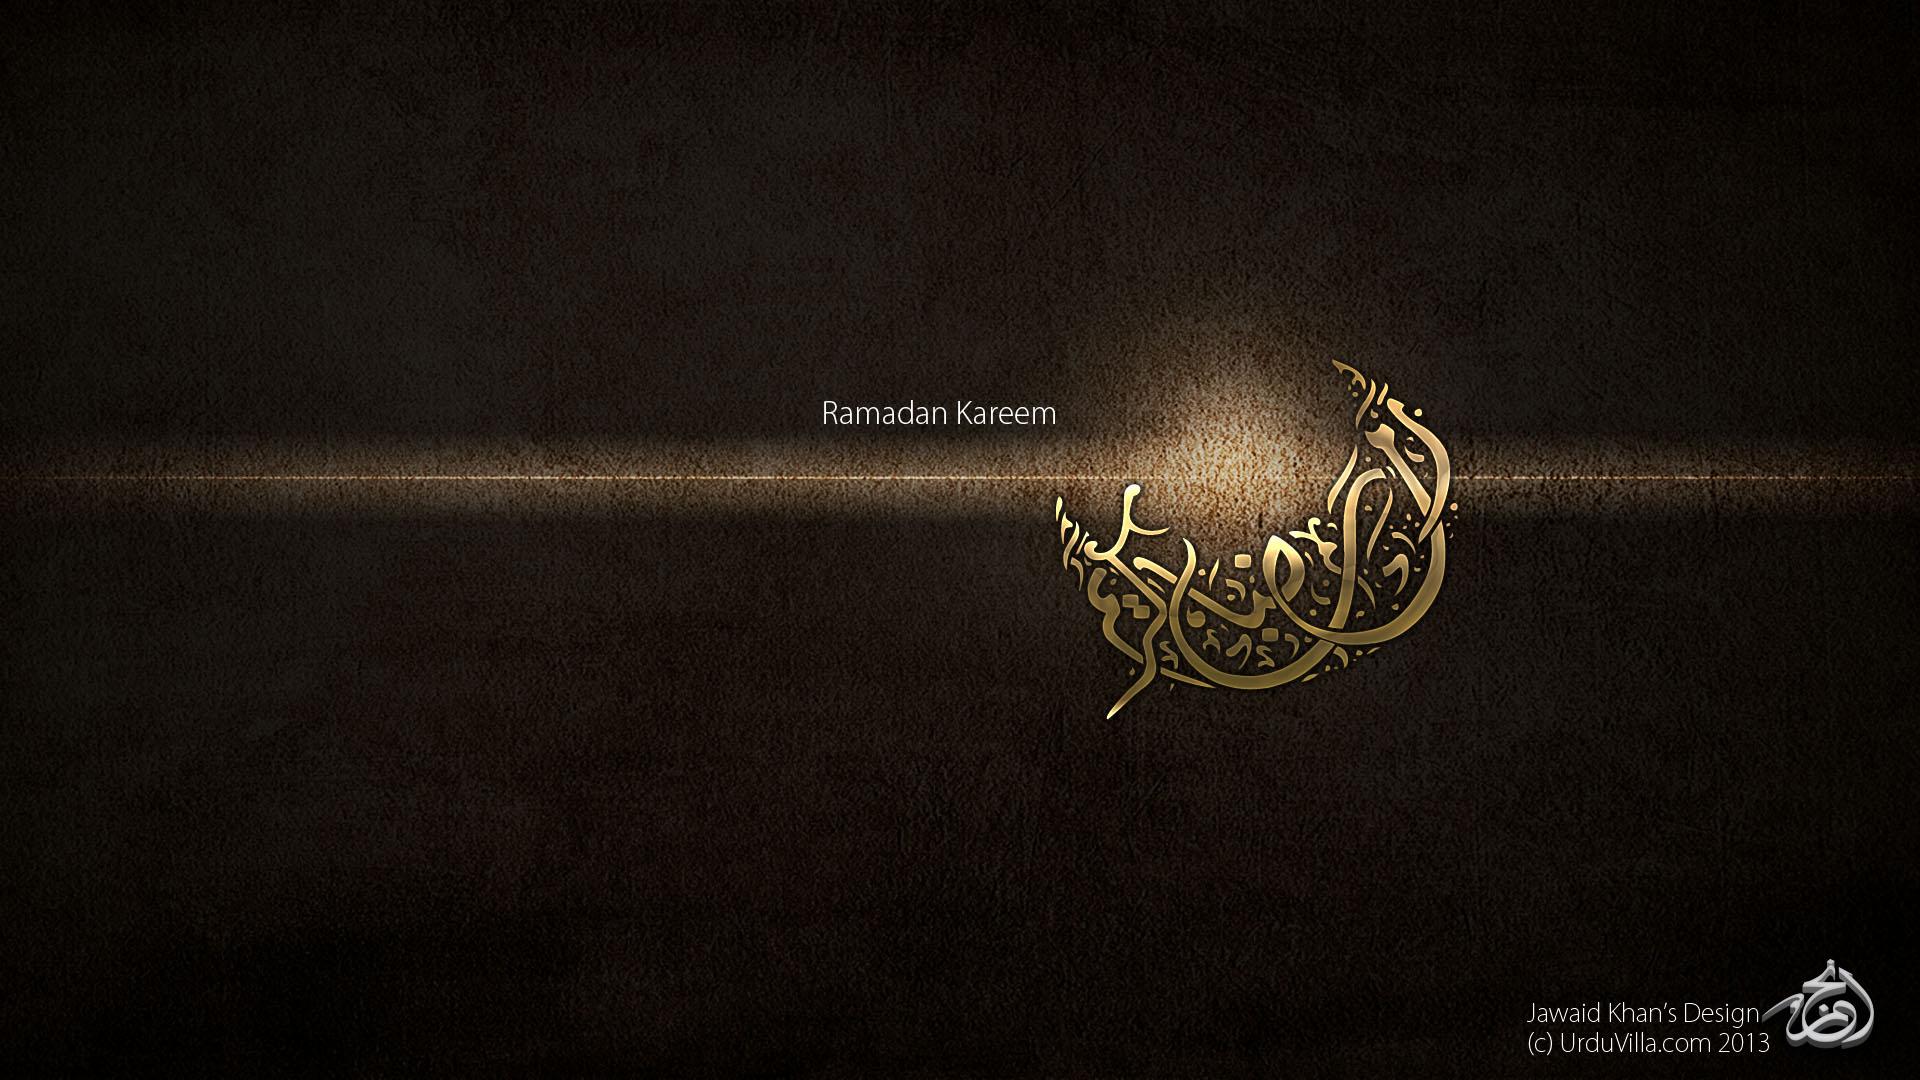 Full HD wallpaper Ramadan Kareem by 475 on DeviantArt for Ramadan Kareem Wallpapers Hd  174mzq